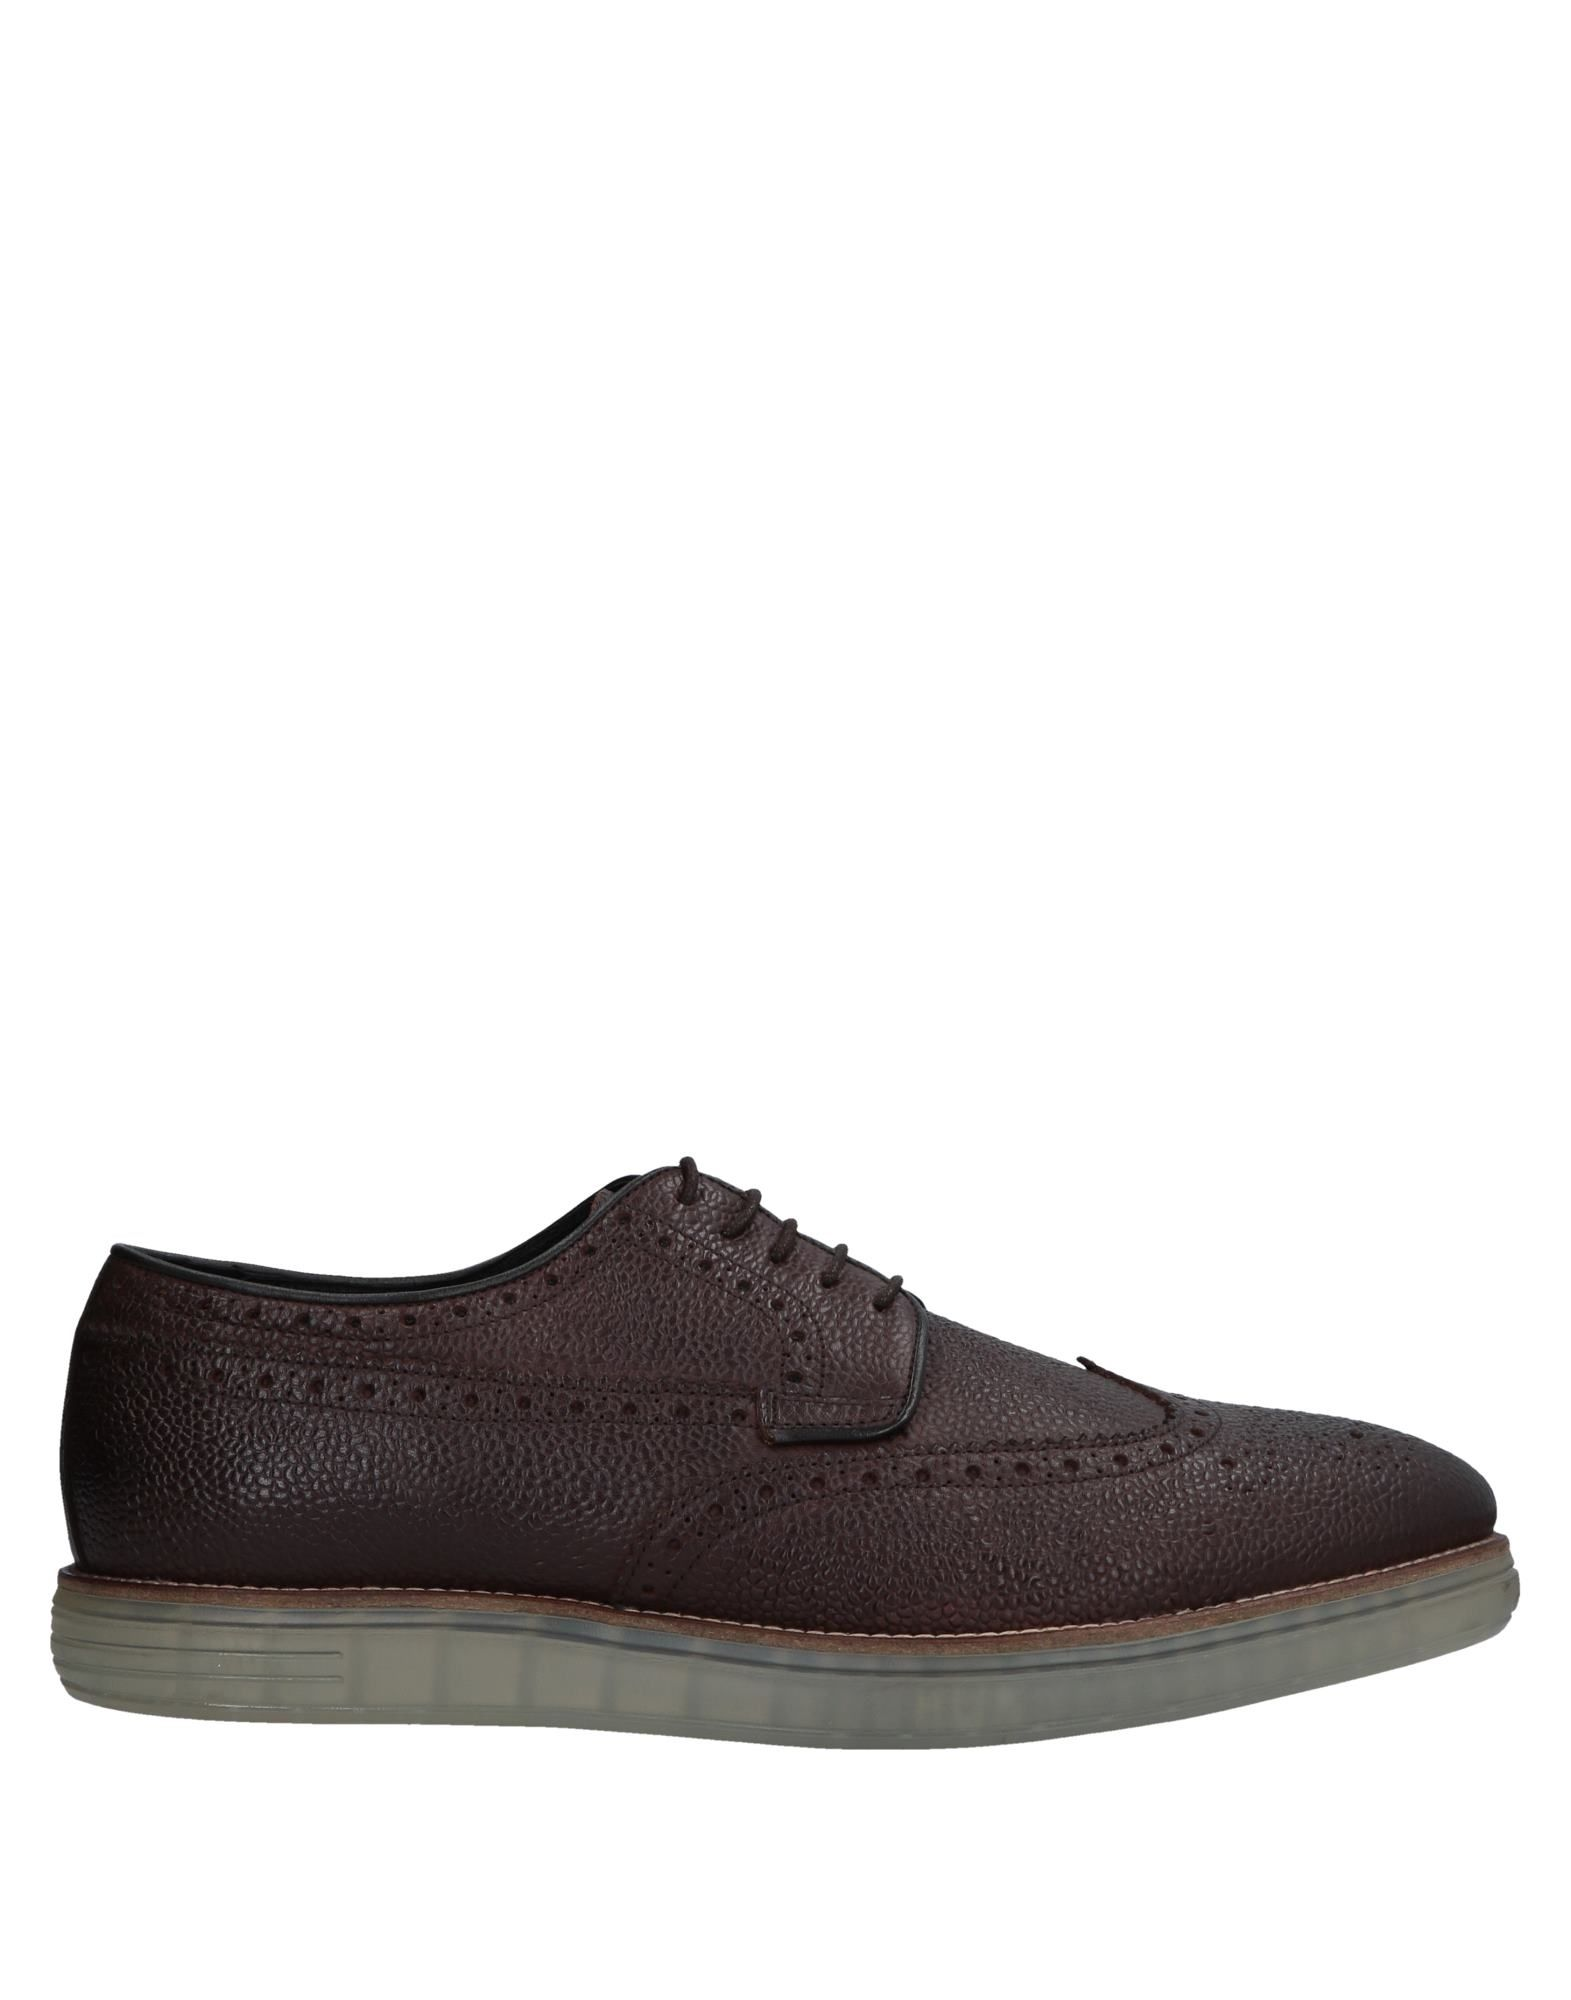 HUDSON Обувь на шнурках h by hudson обувь на шнурках